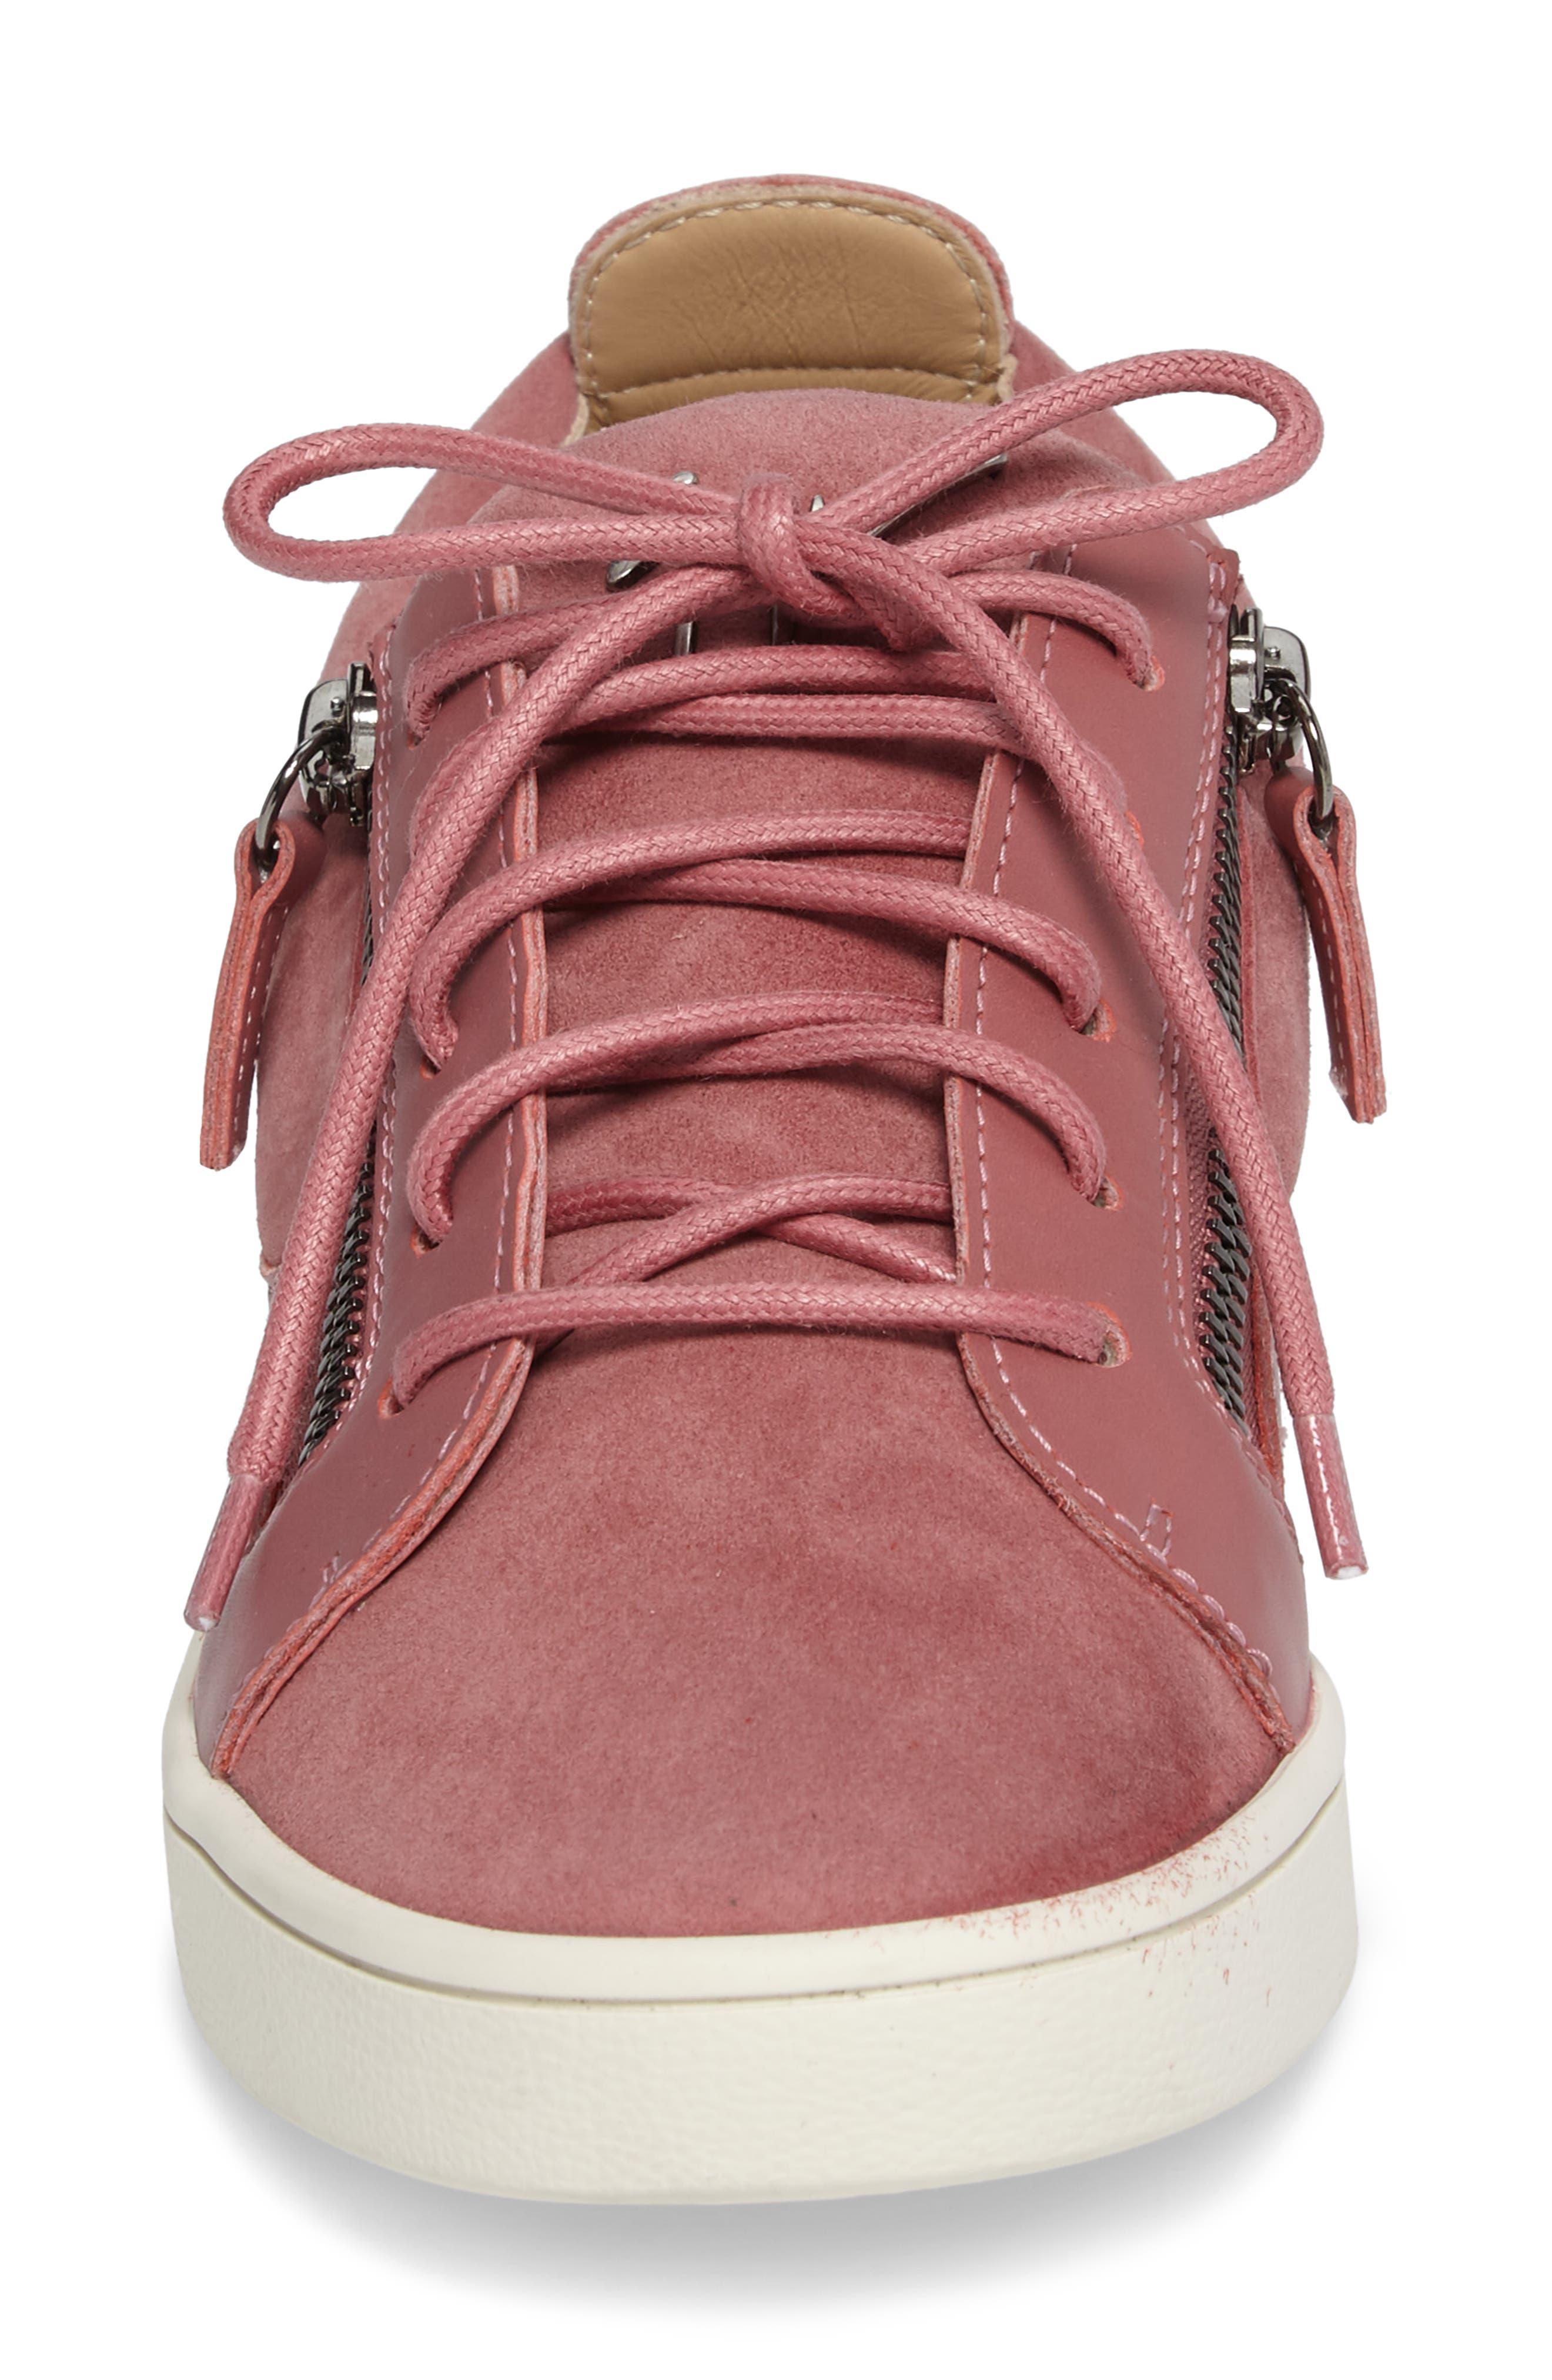 Low Top Zip Sneaker,                             Alternate thumbnail 4, color,                             Pink